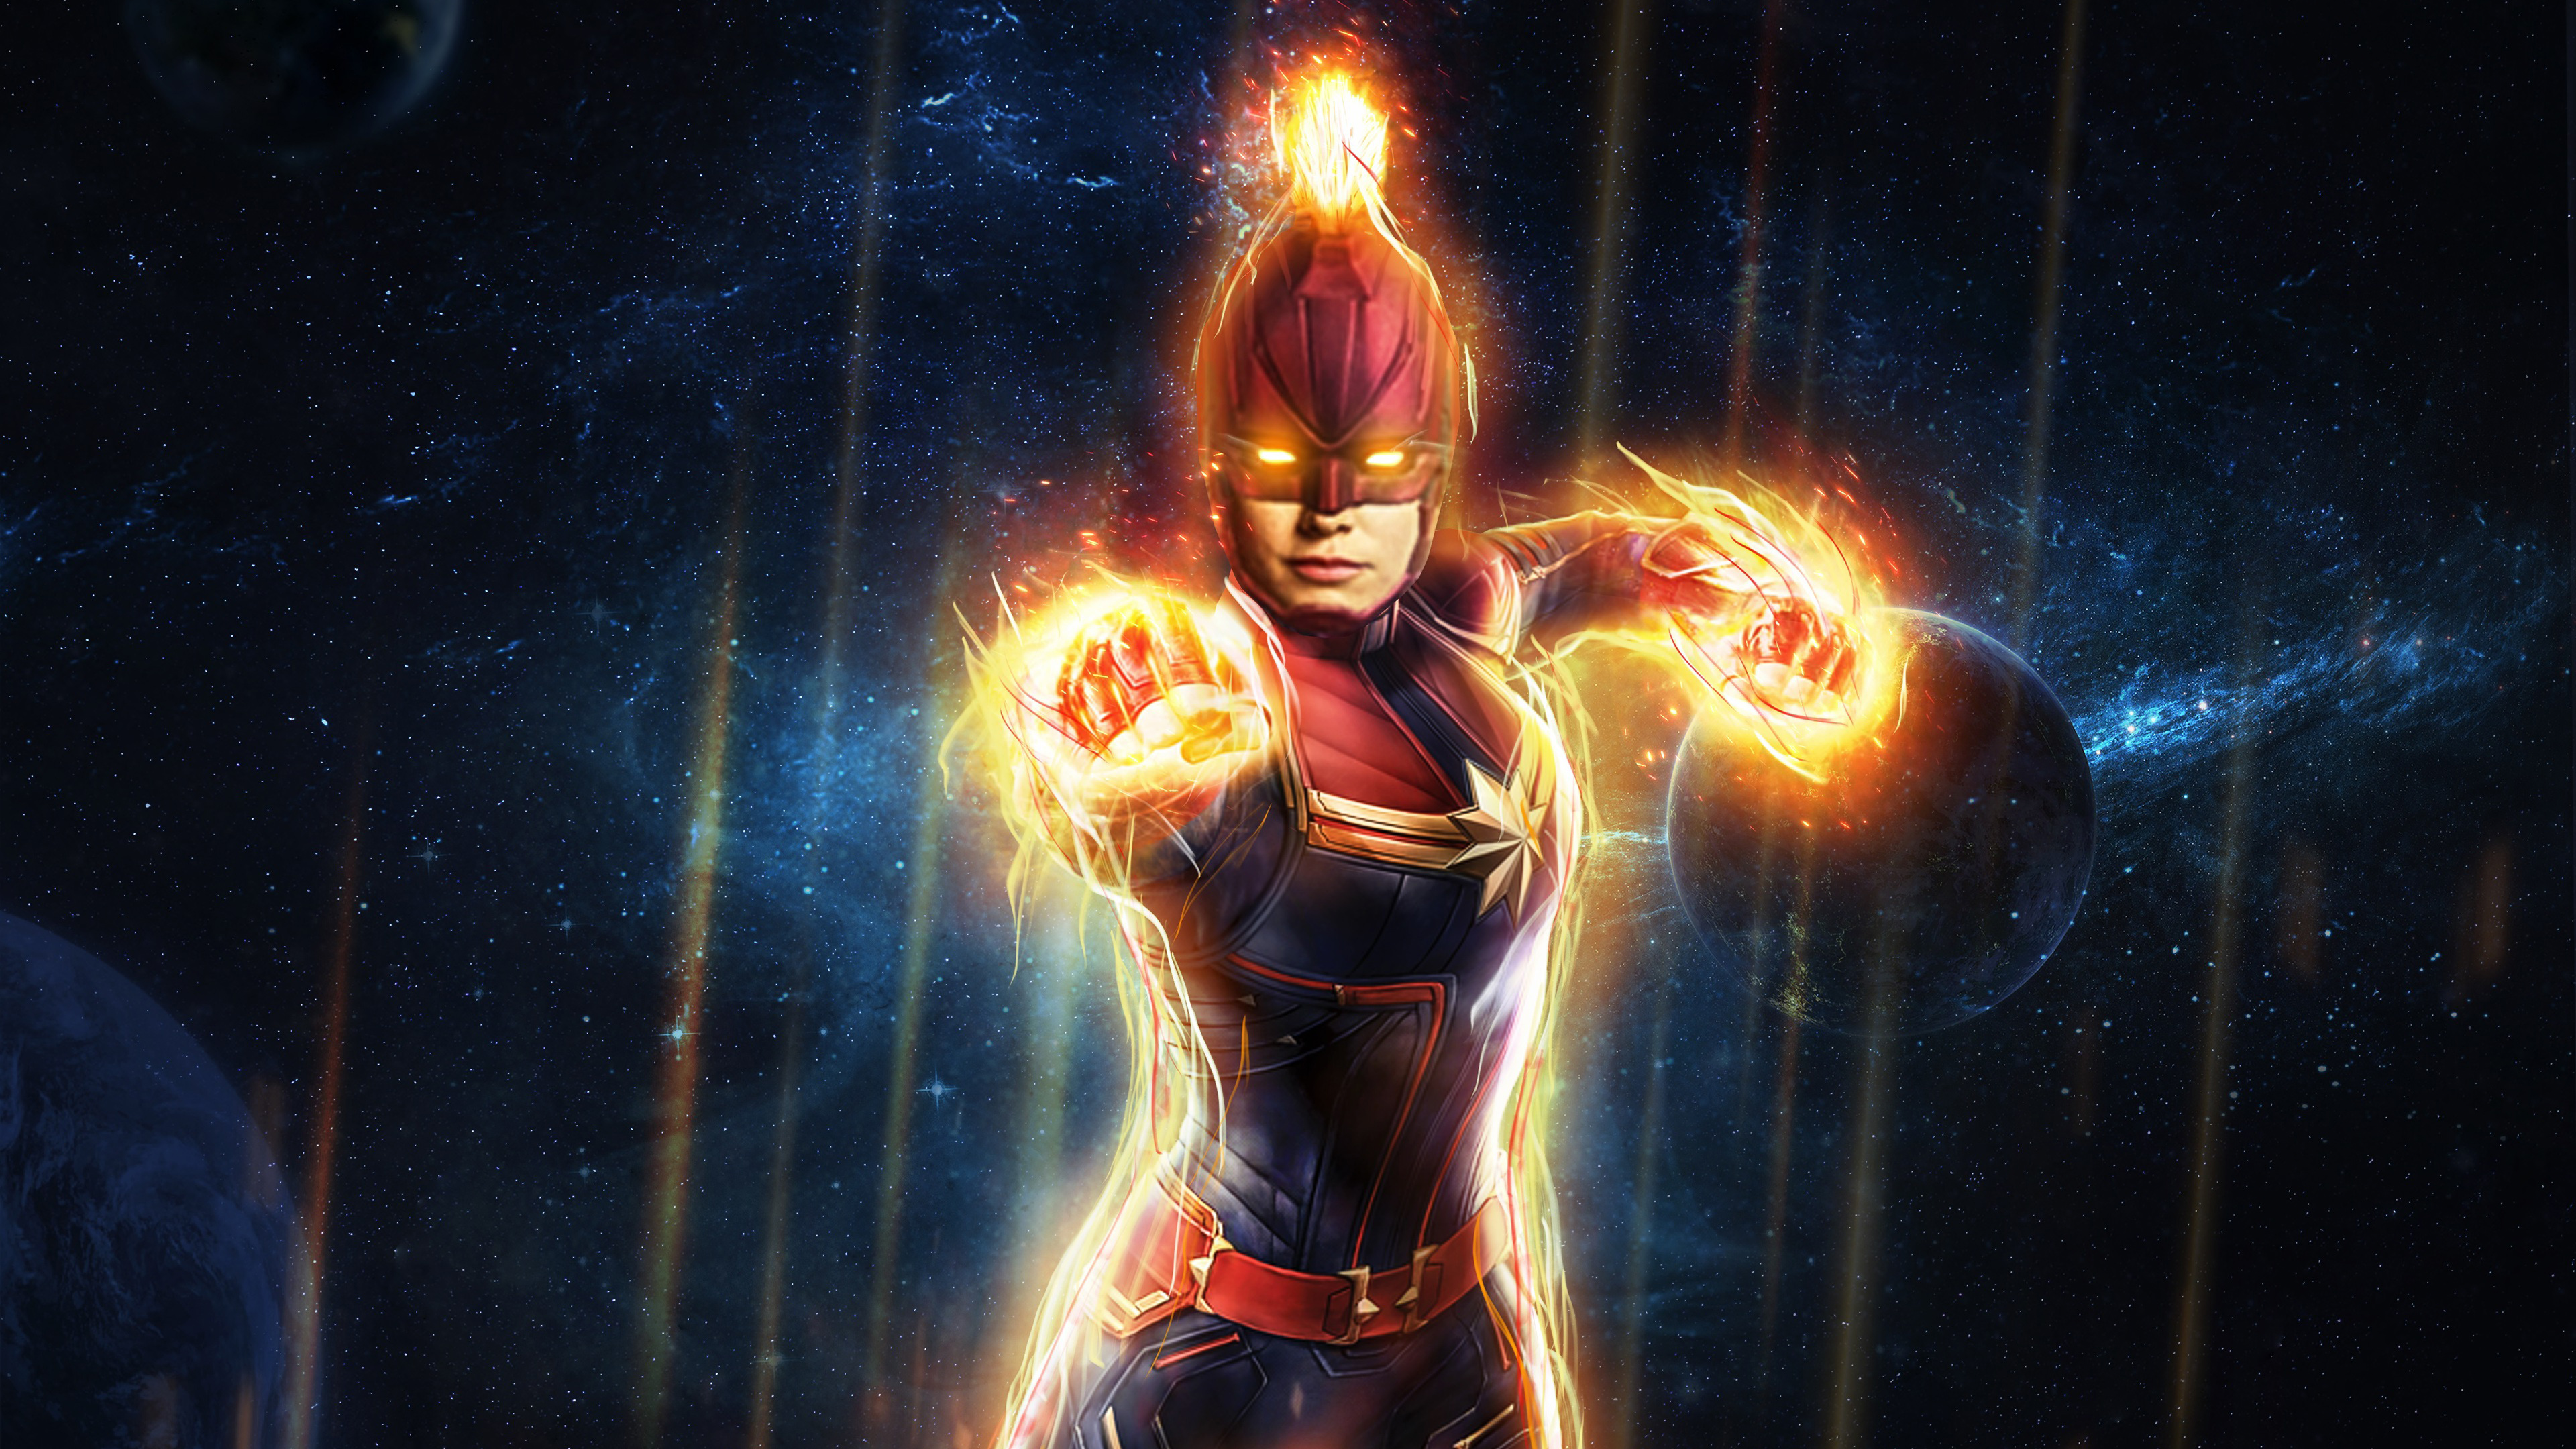 Captain Marvel Flying High In Space Hd Superheroes 4k Wallpapers